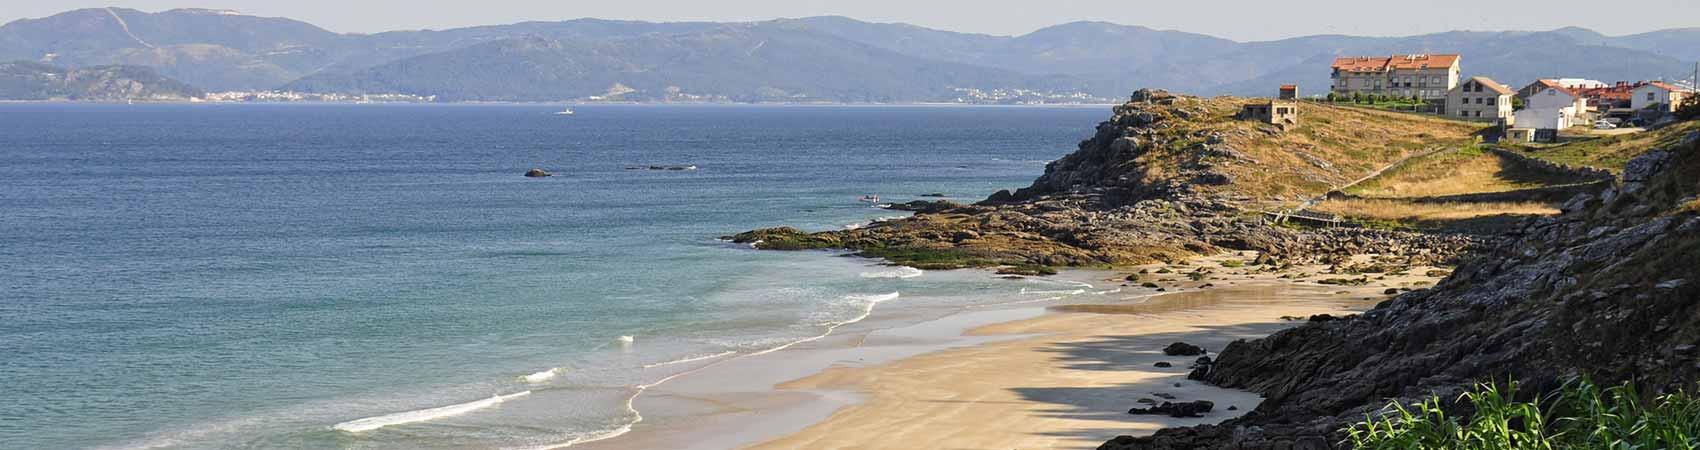 location vacances plage espagne